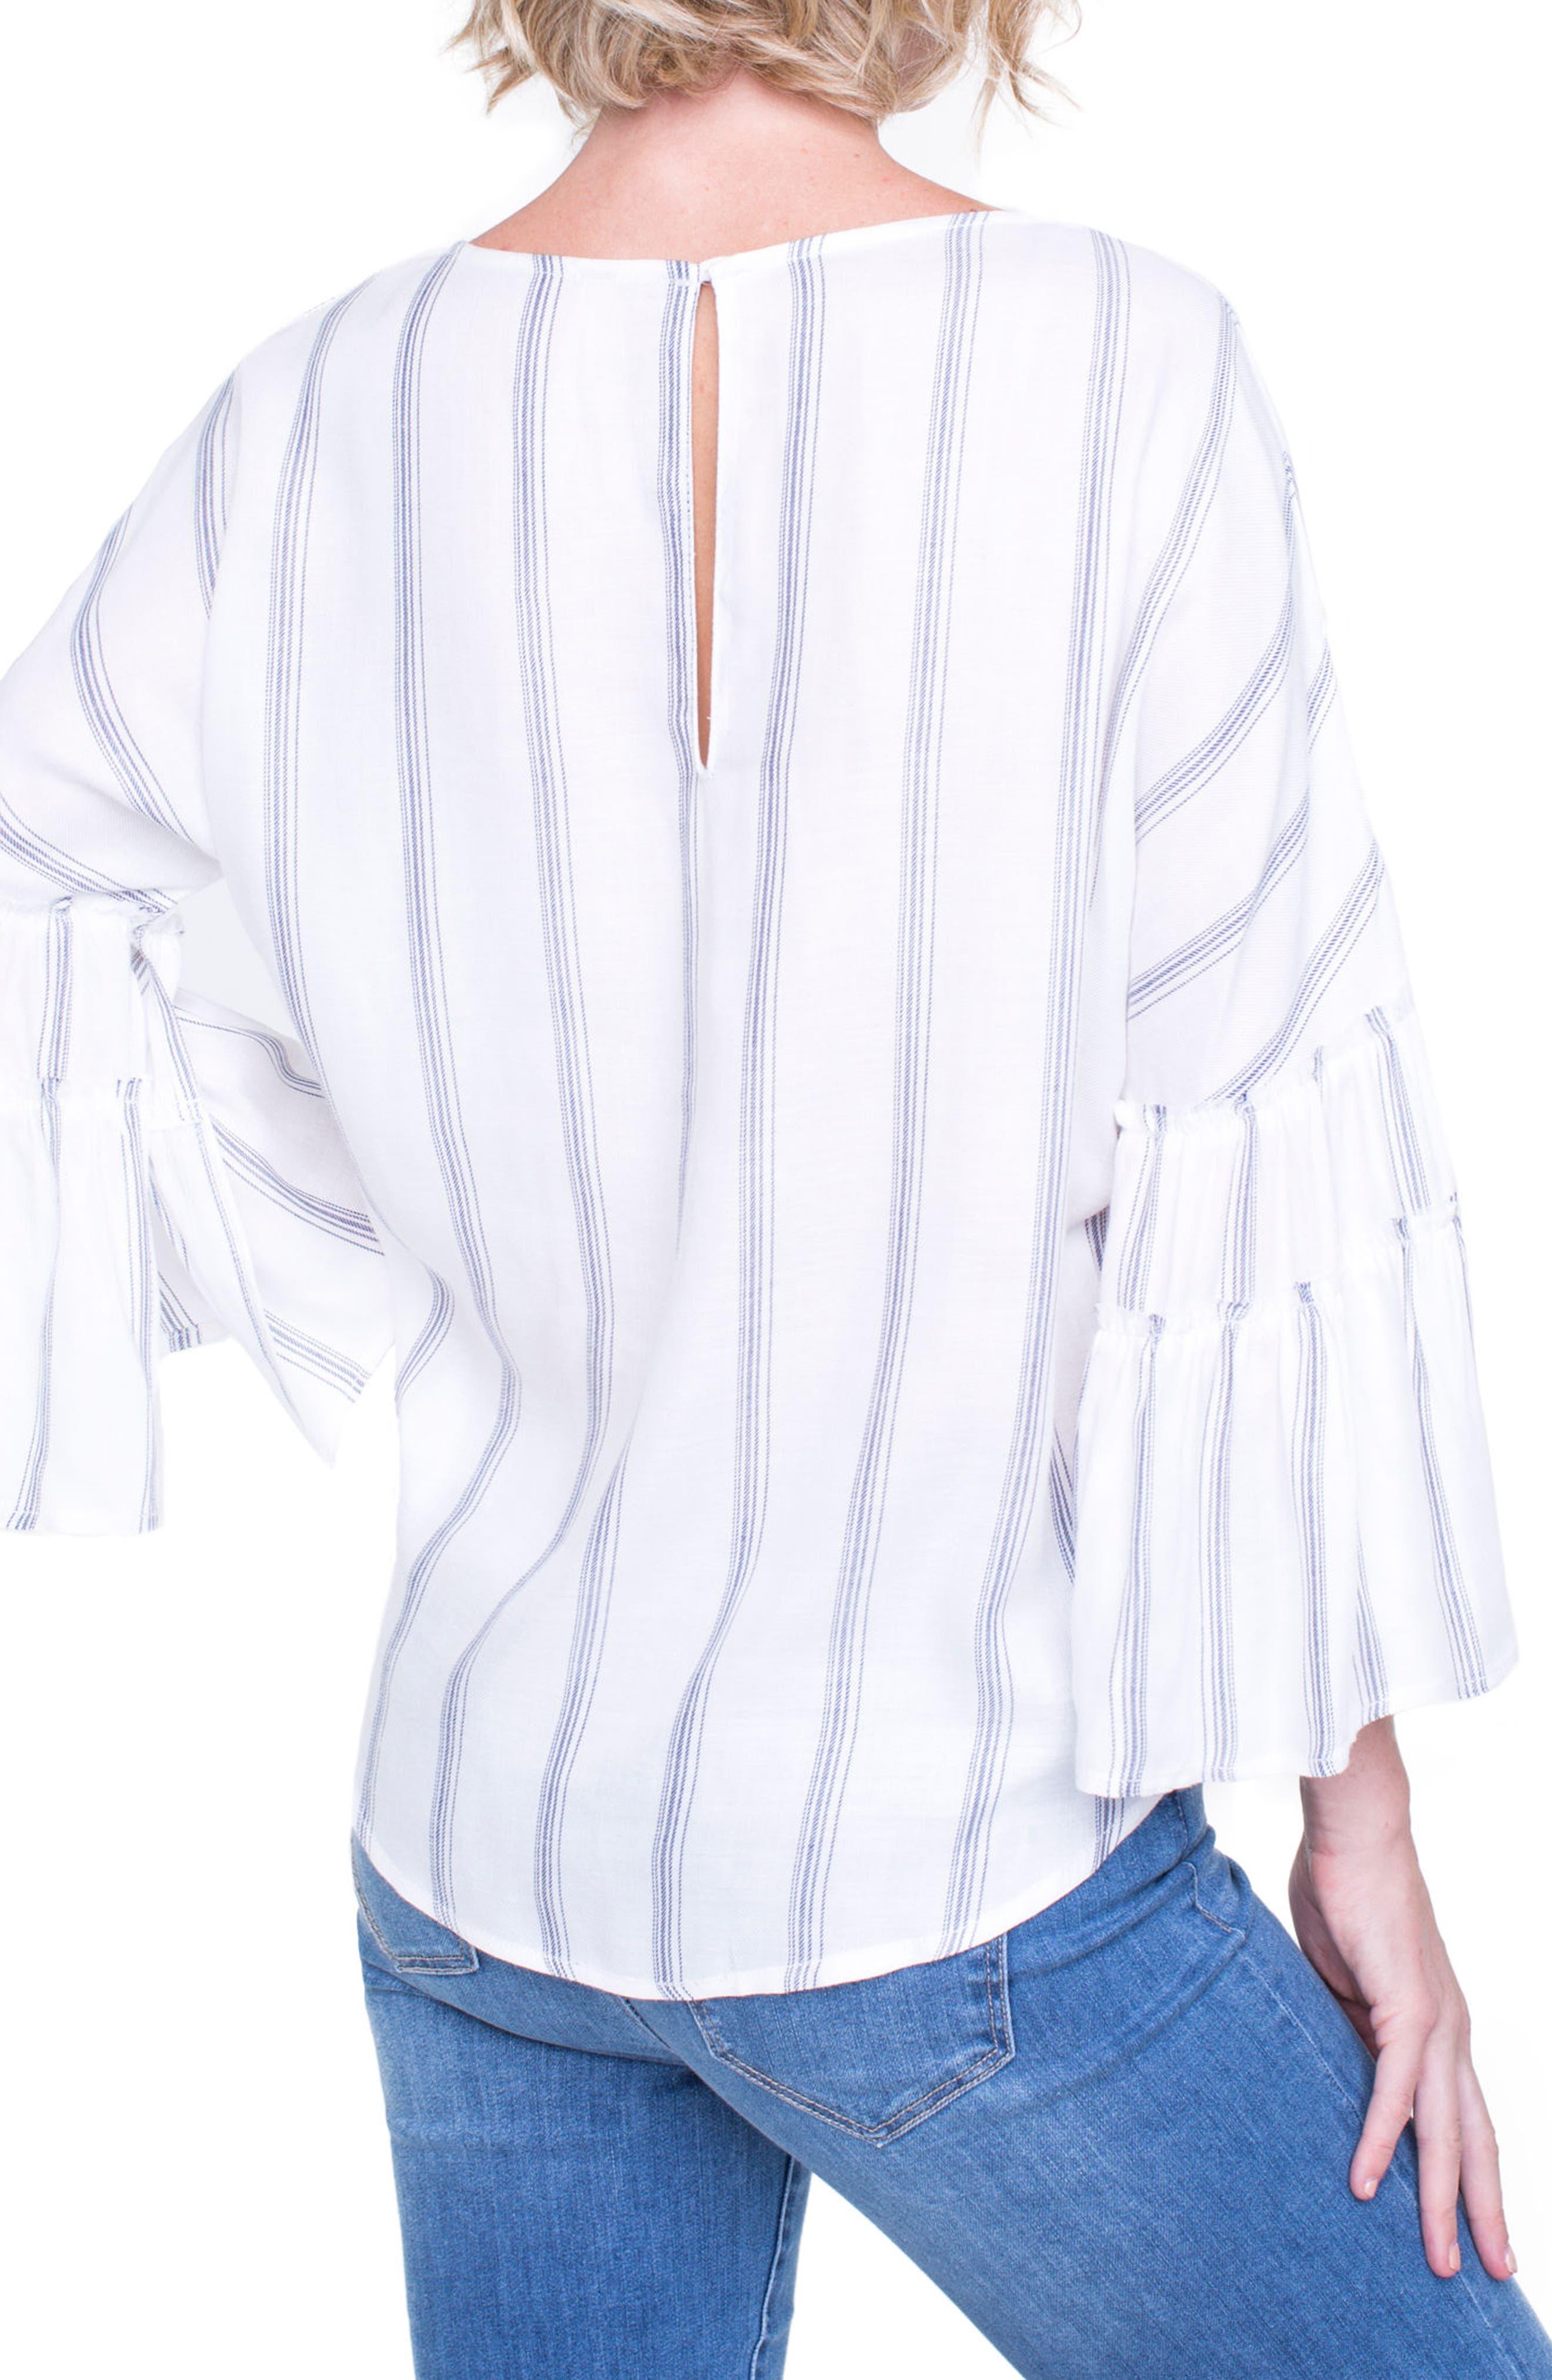 Voluminous Sleeve Shirt,                             Alternate thumbnail 2, color,                             100